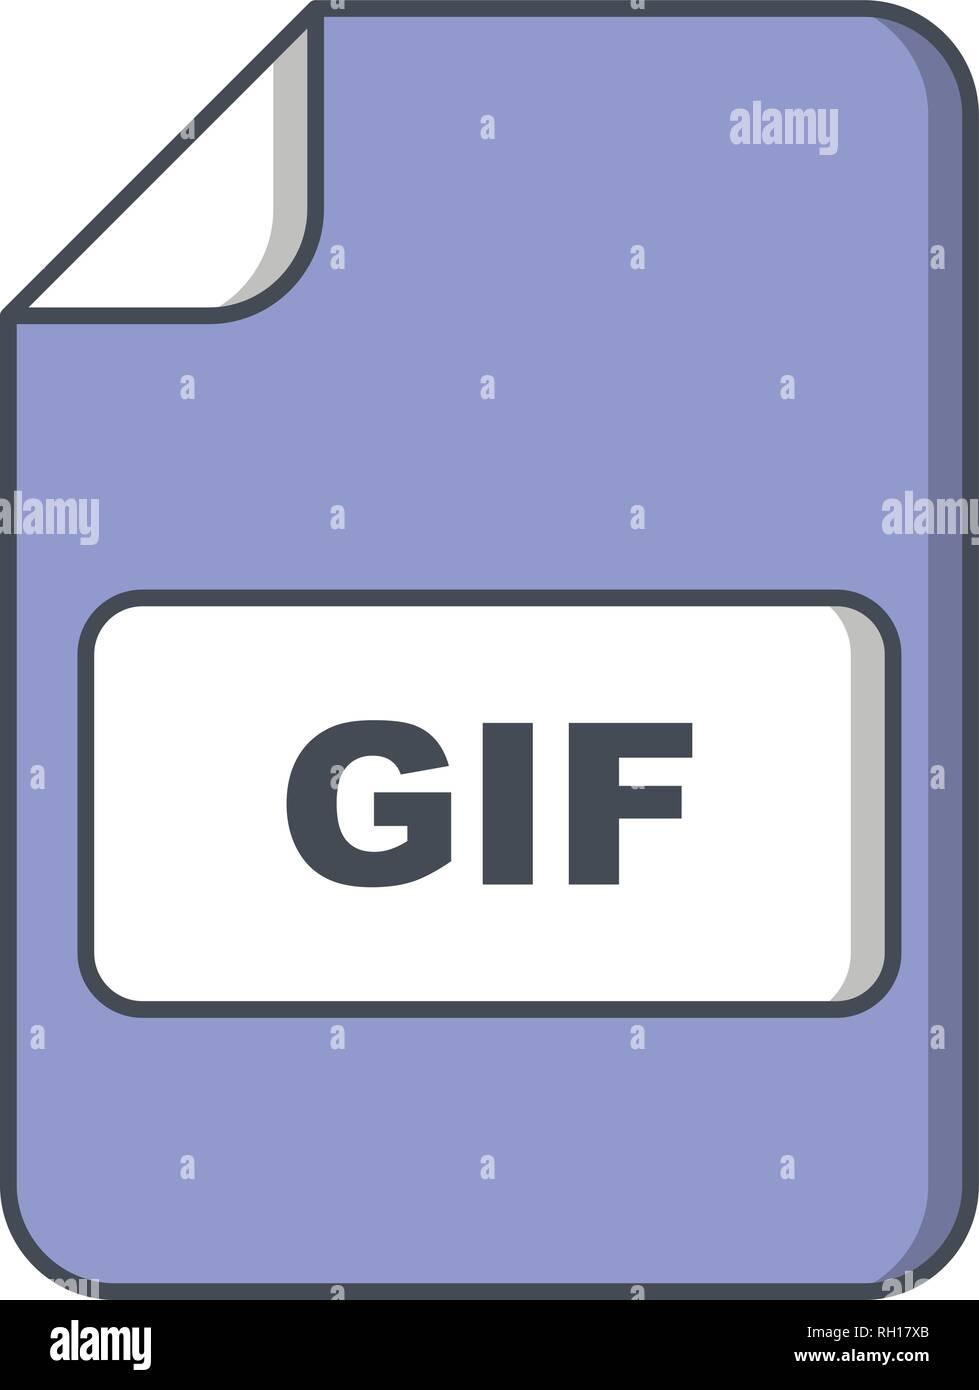 Gif Vector Vectors Immagini Gif Vector Vectors Fotos Stock Alamy